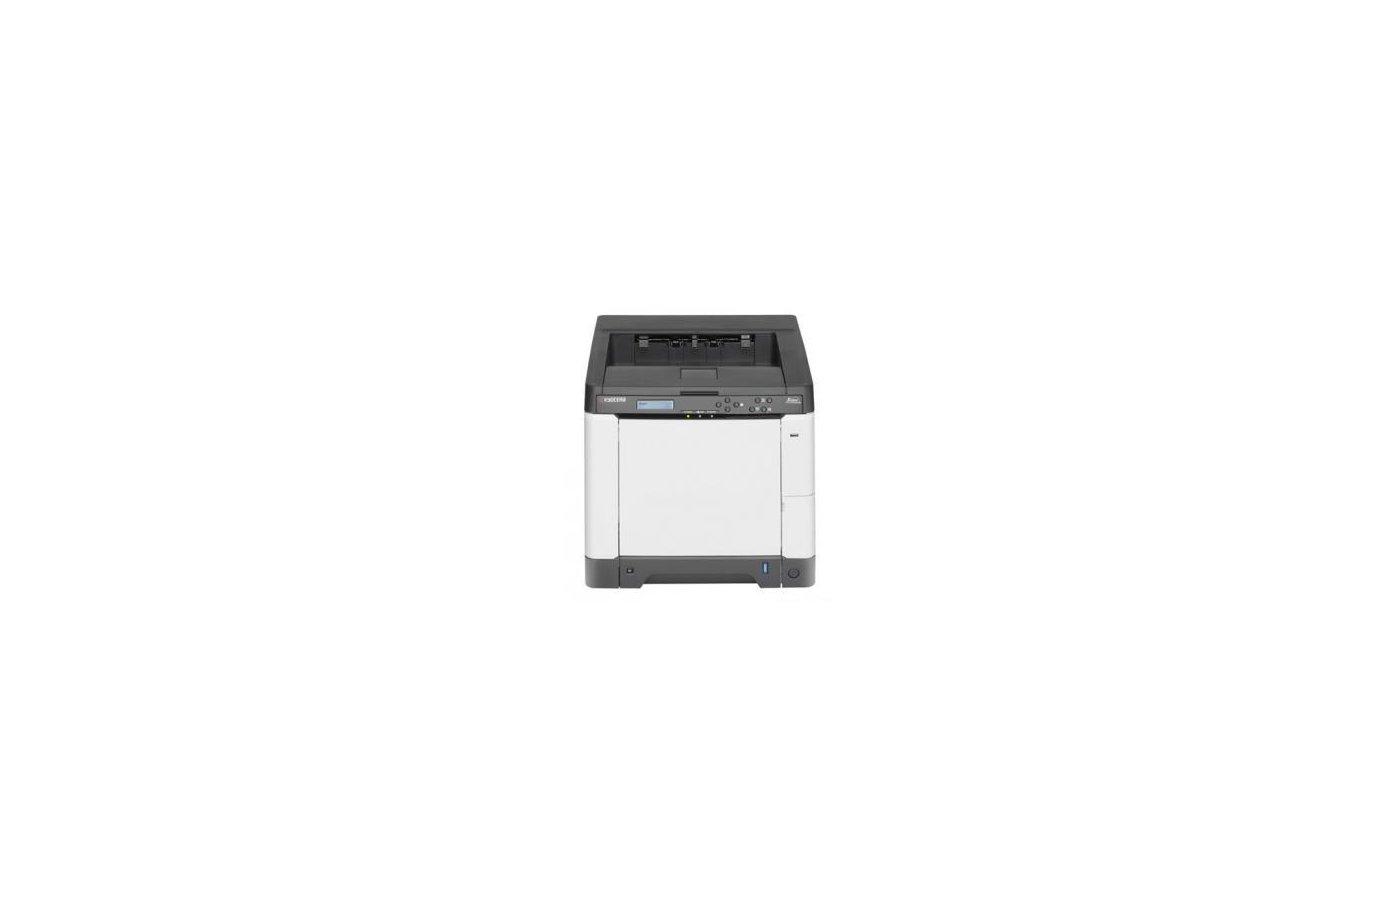 Принтер Kyocera Ecosys P6021cdn A4 Duplex Net